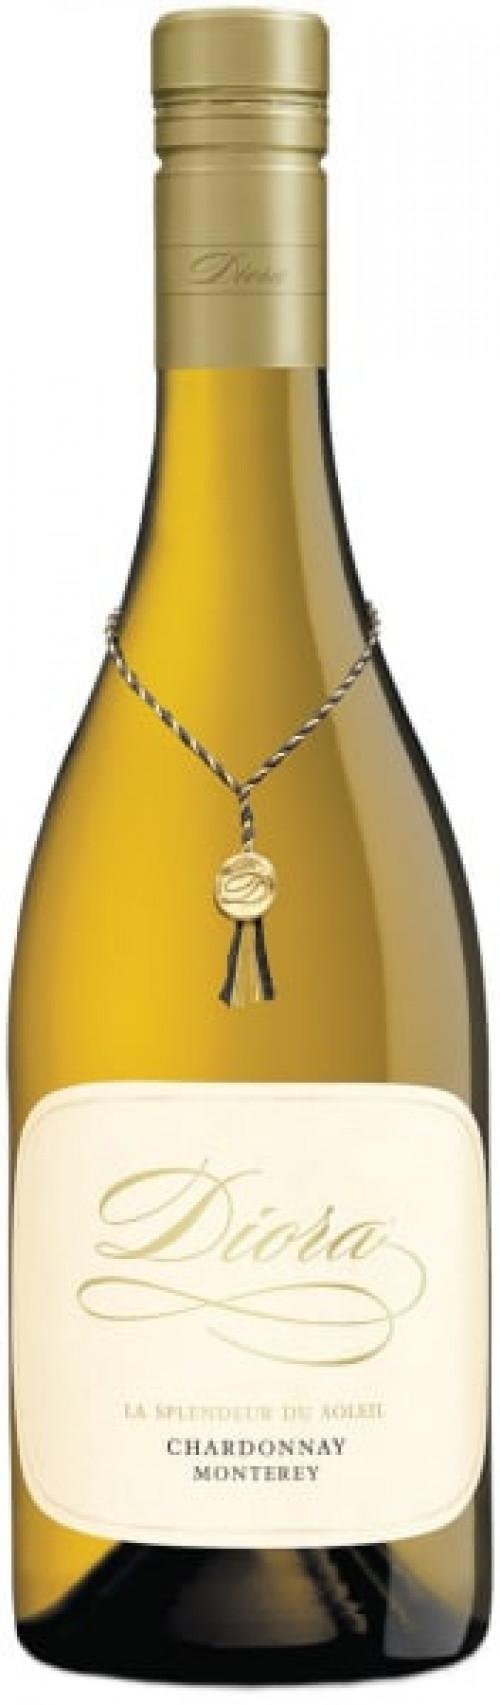 2018 Diora Chardonnay La Splendeur Du Soleil 750ml